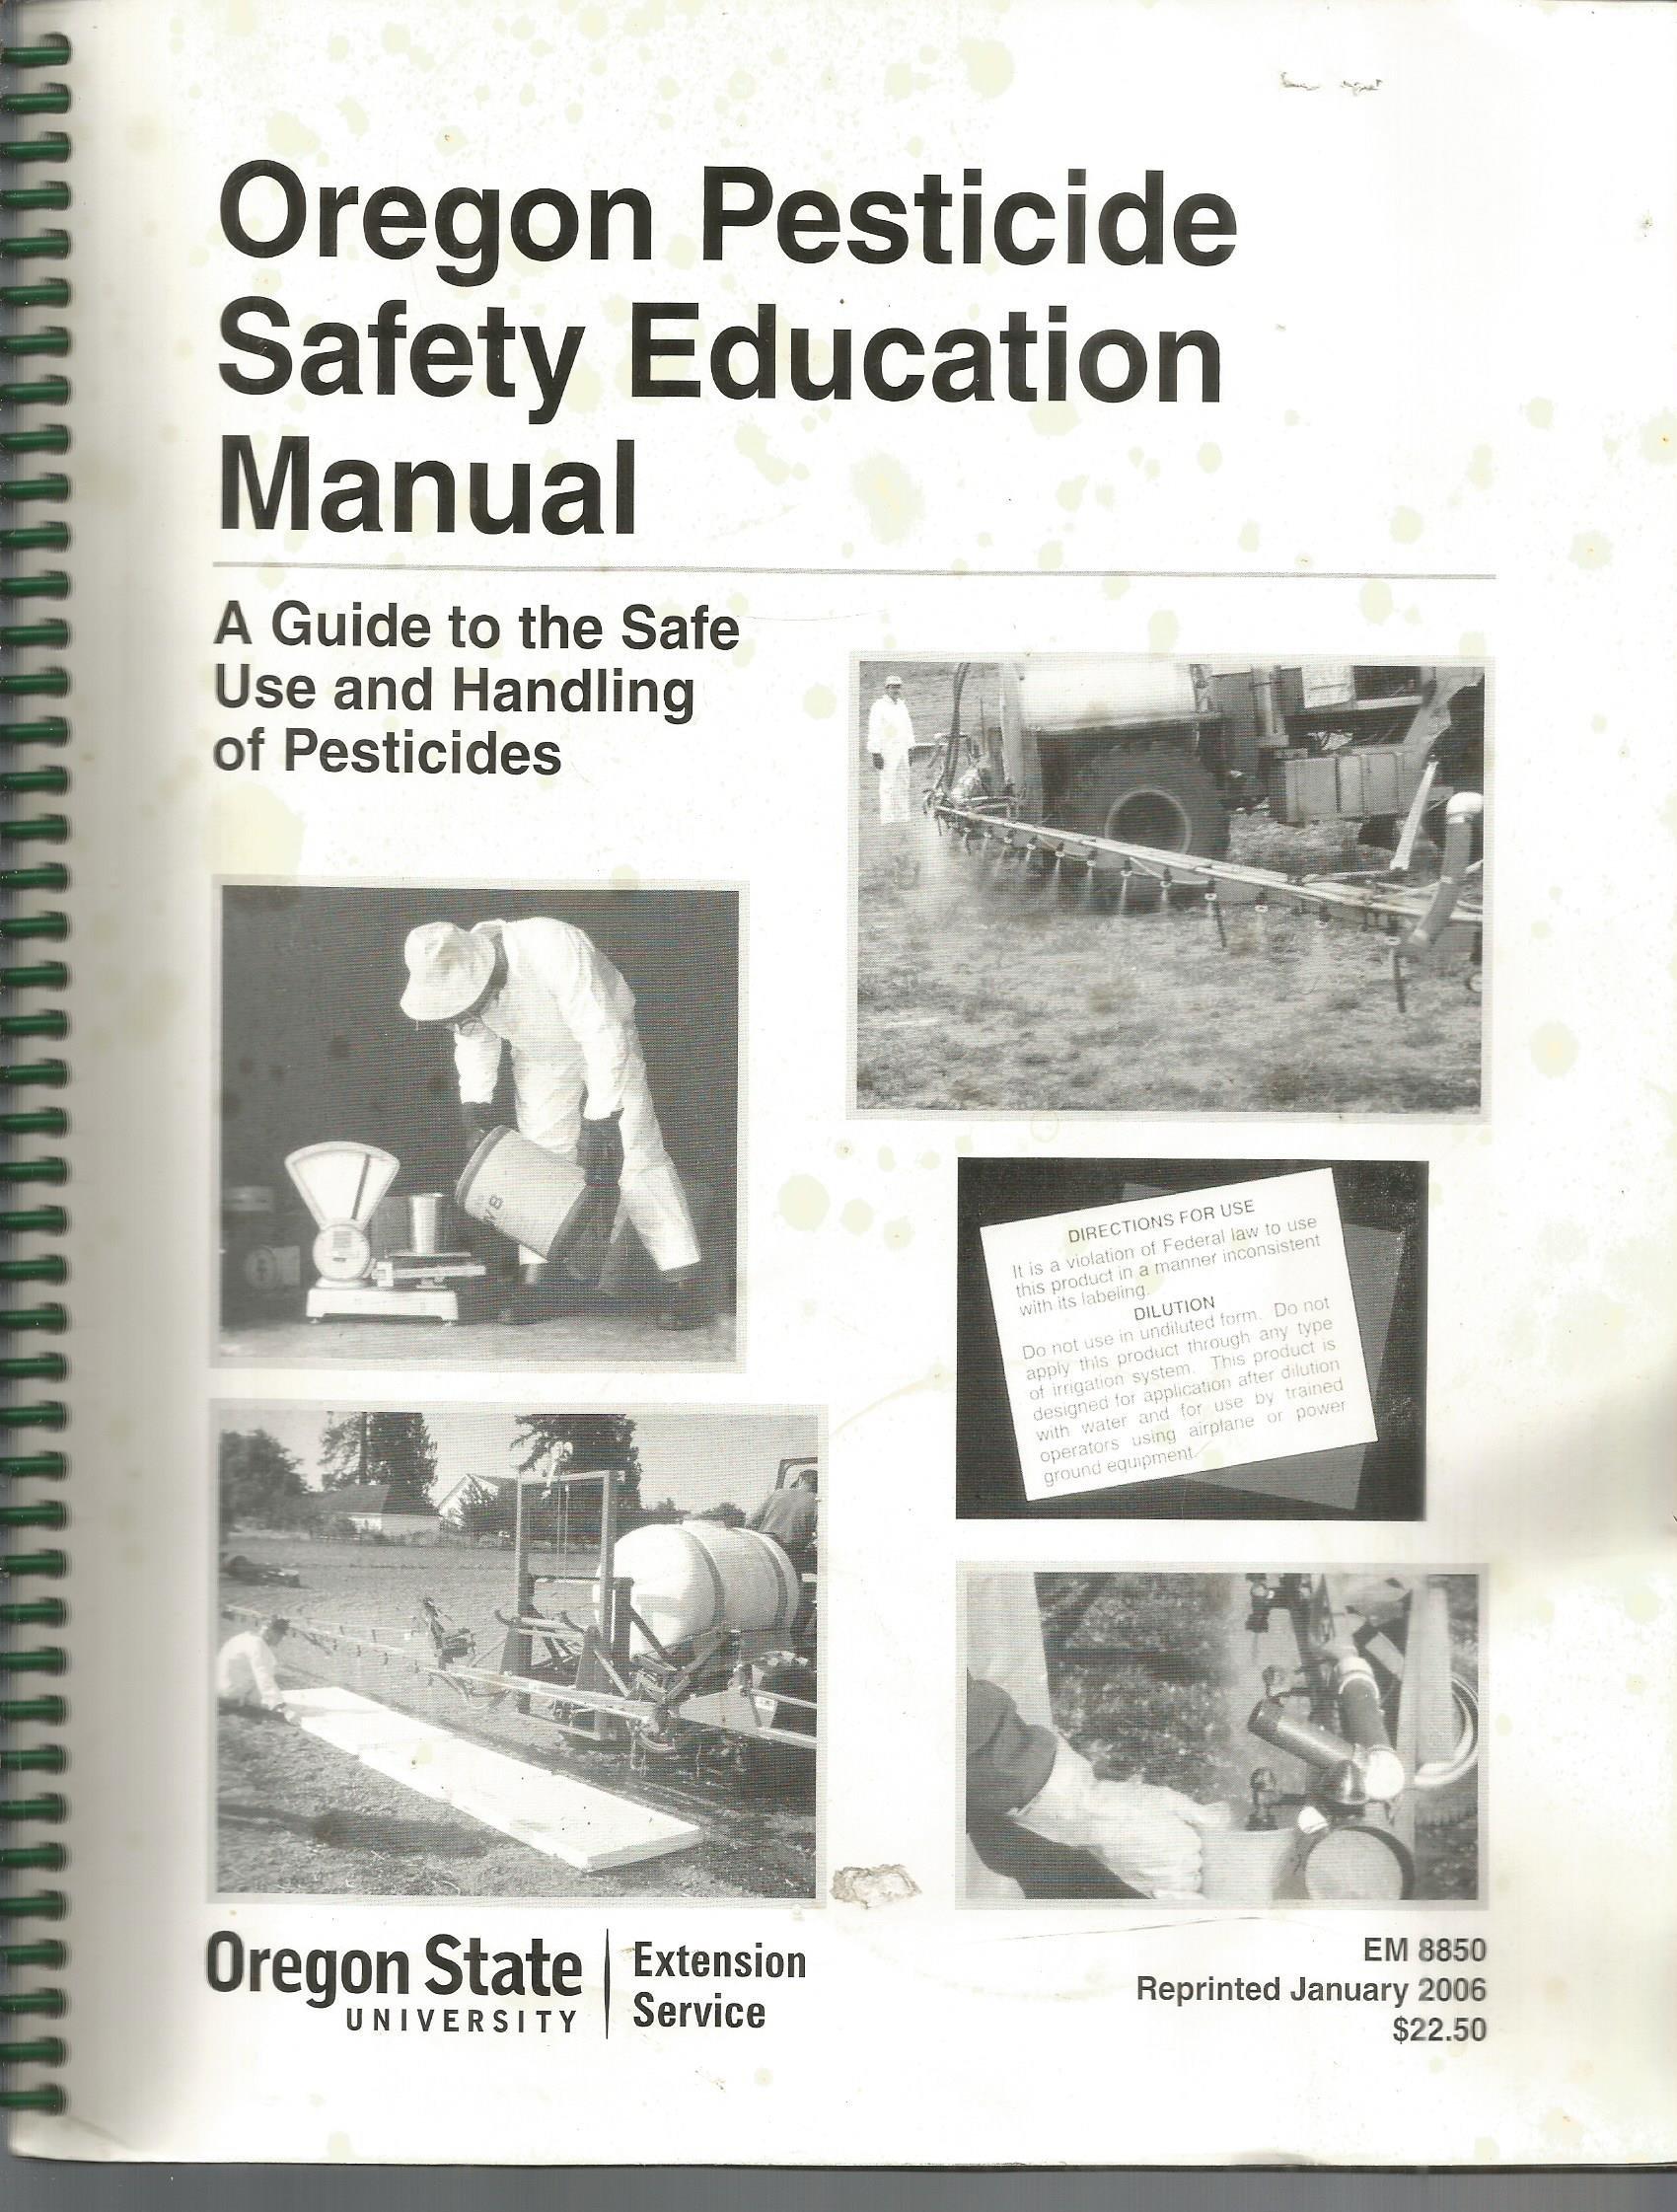 oregon pesticide safety education manual myron shenk amazon com books rh amazon com oregon pesticide safety education manual pdf Pesticide Awareness